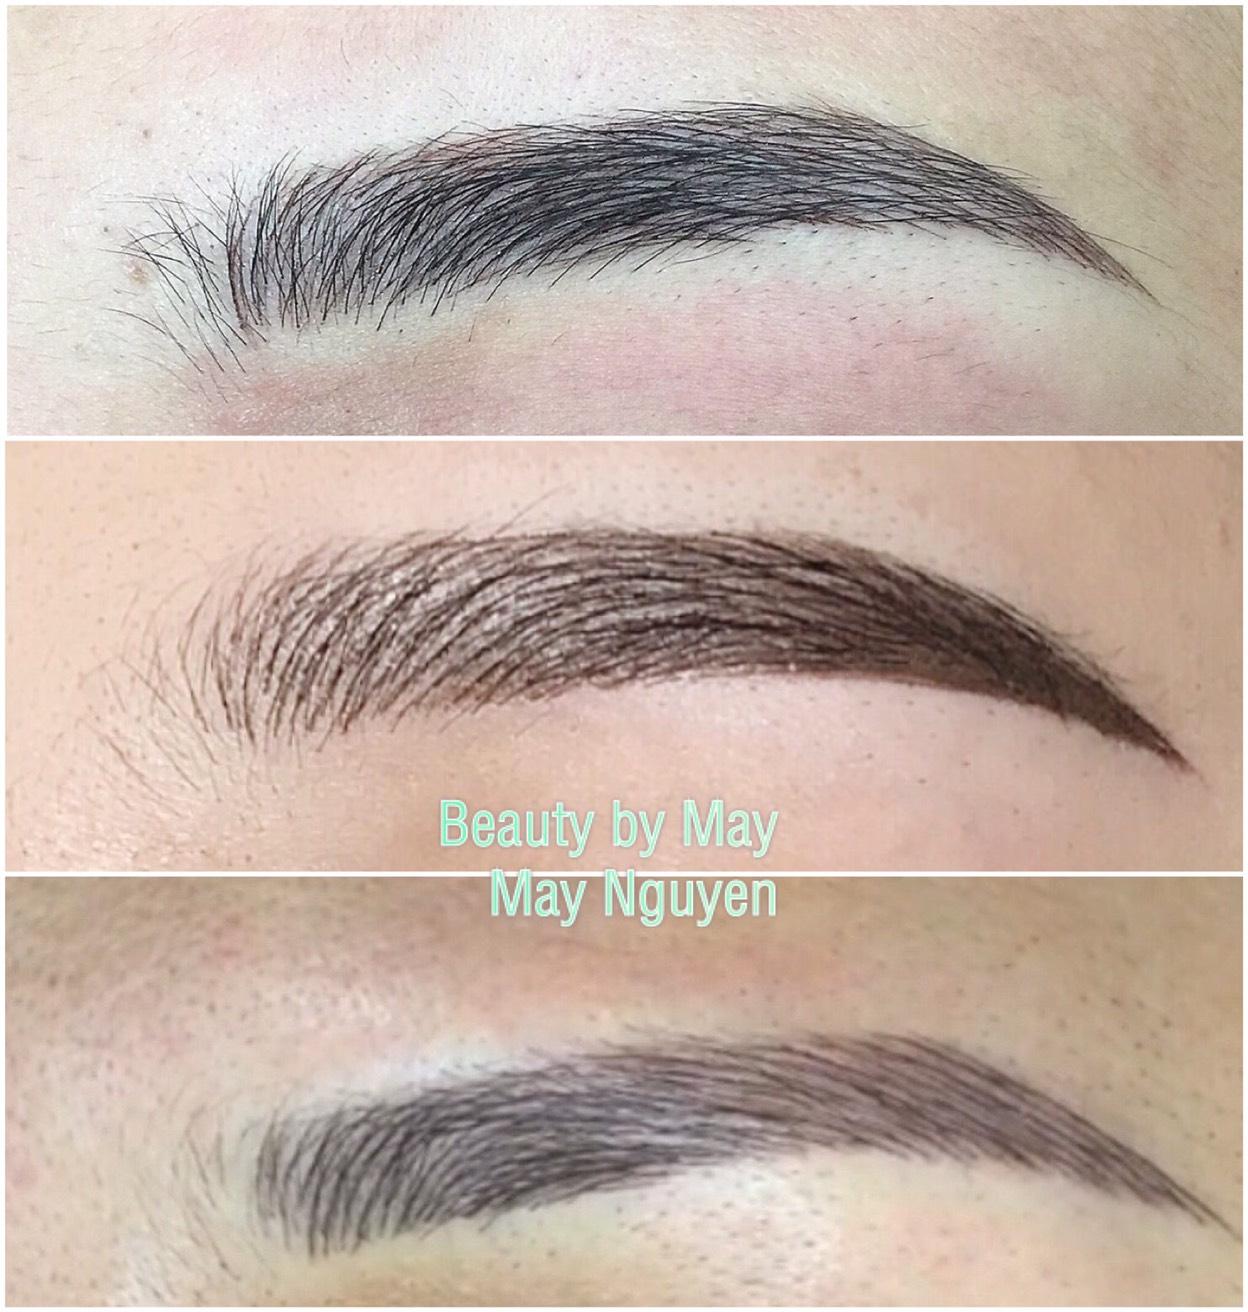 0f521daea62 beautybymay.com - Brow Microblading - Makeup Artist, Eyelash Extension,  Nail, Airbrush, Massage, Flower, Hawaii